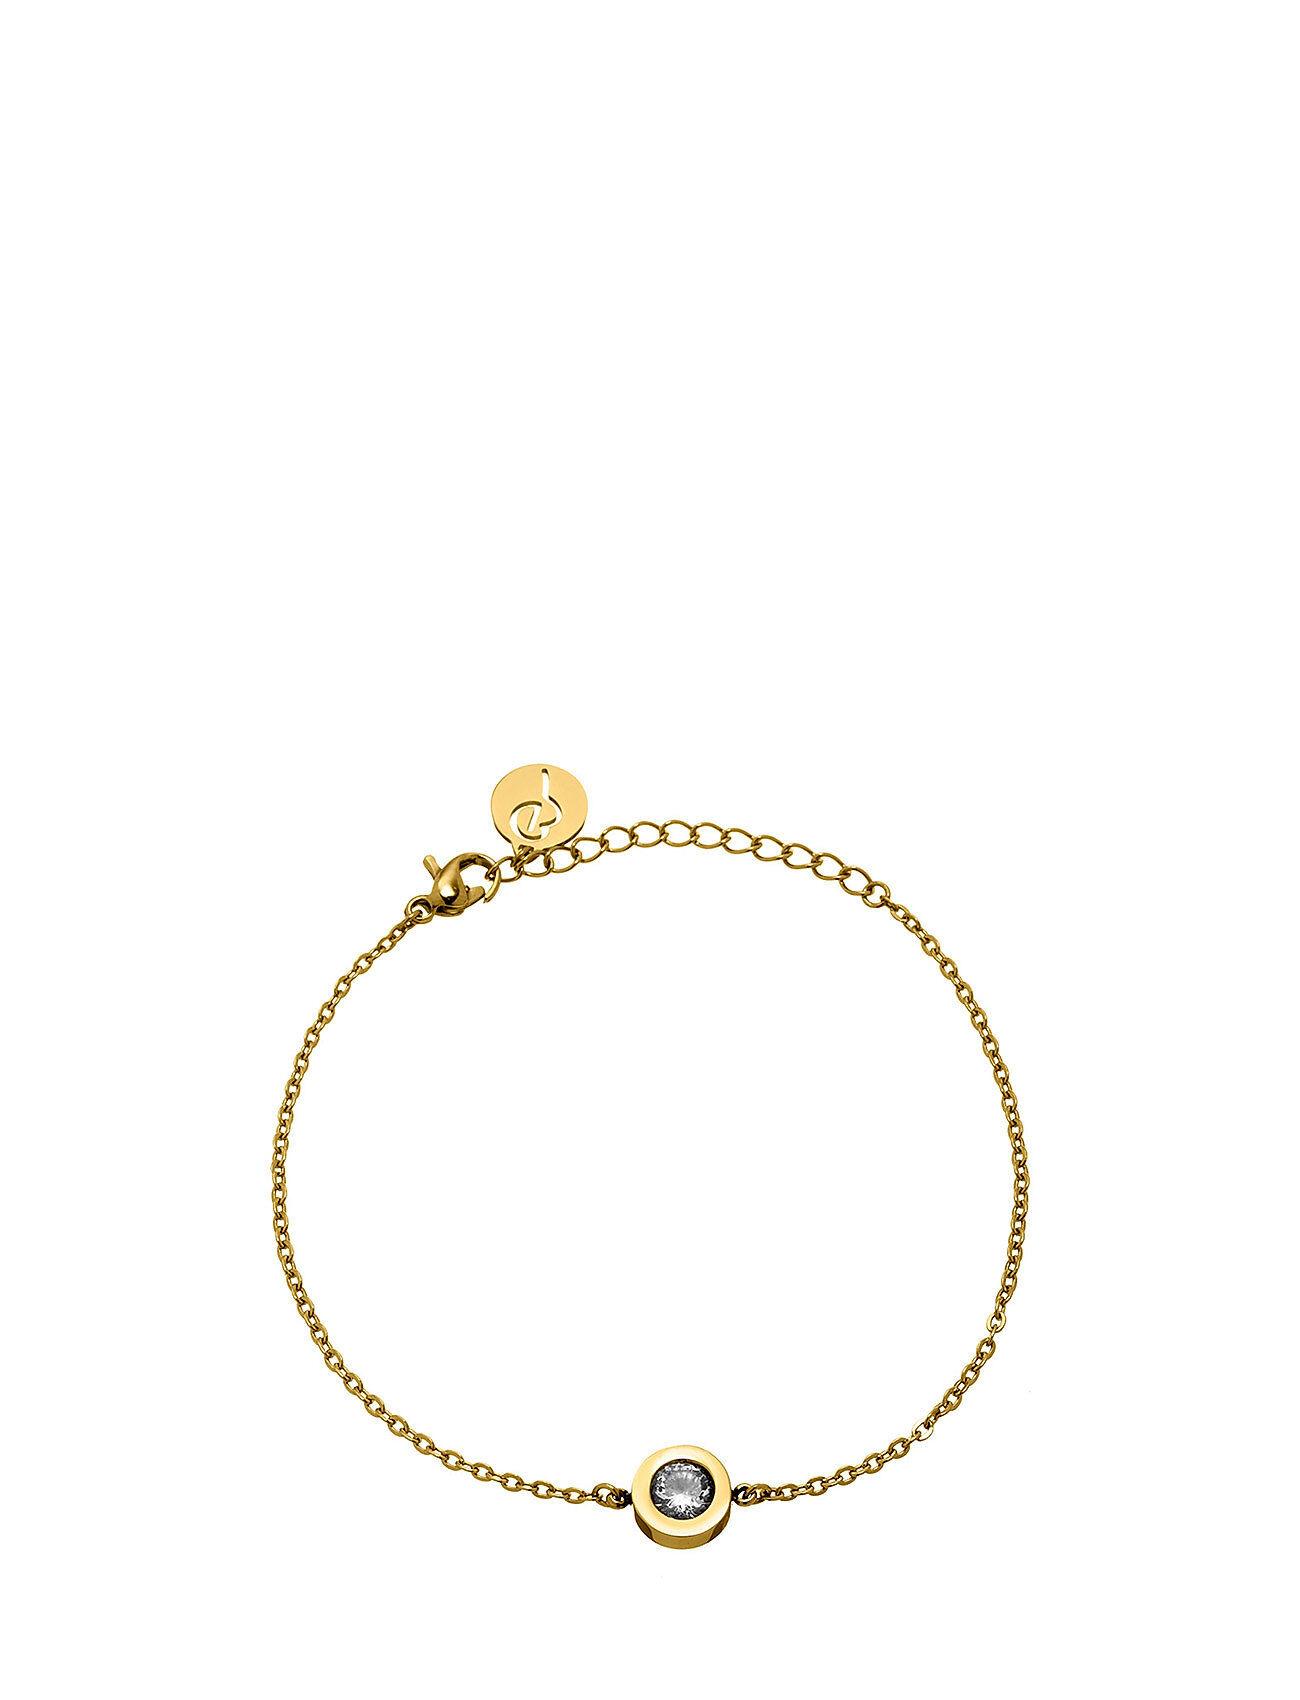 Edblad Stella Bracelet Accessories Jewellery Bracelets Chain Bracelets Kulta Edblad